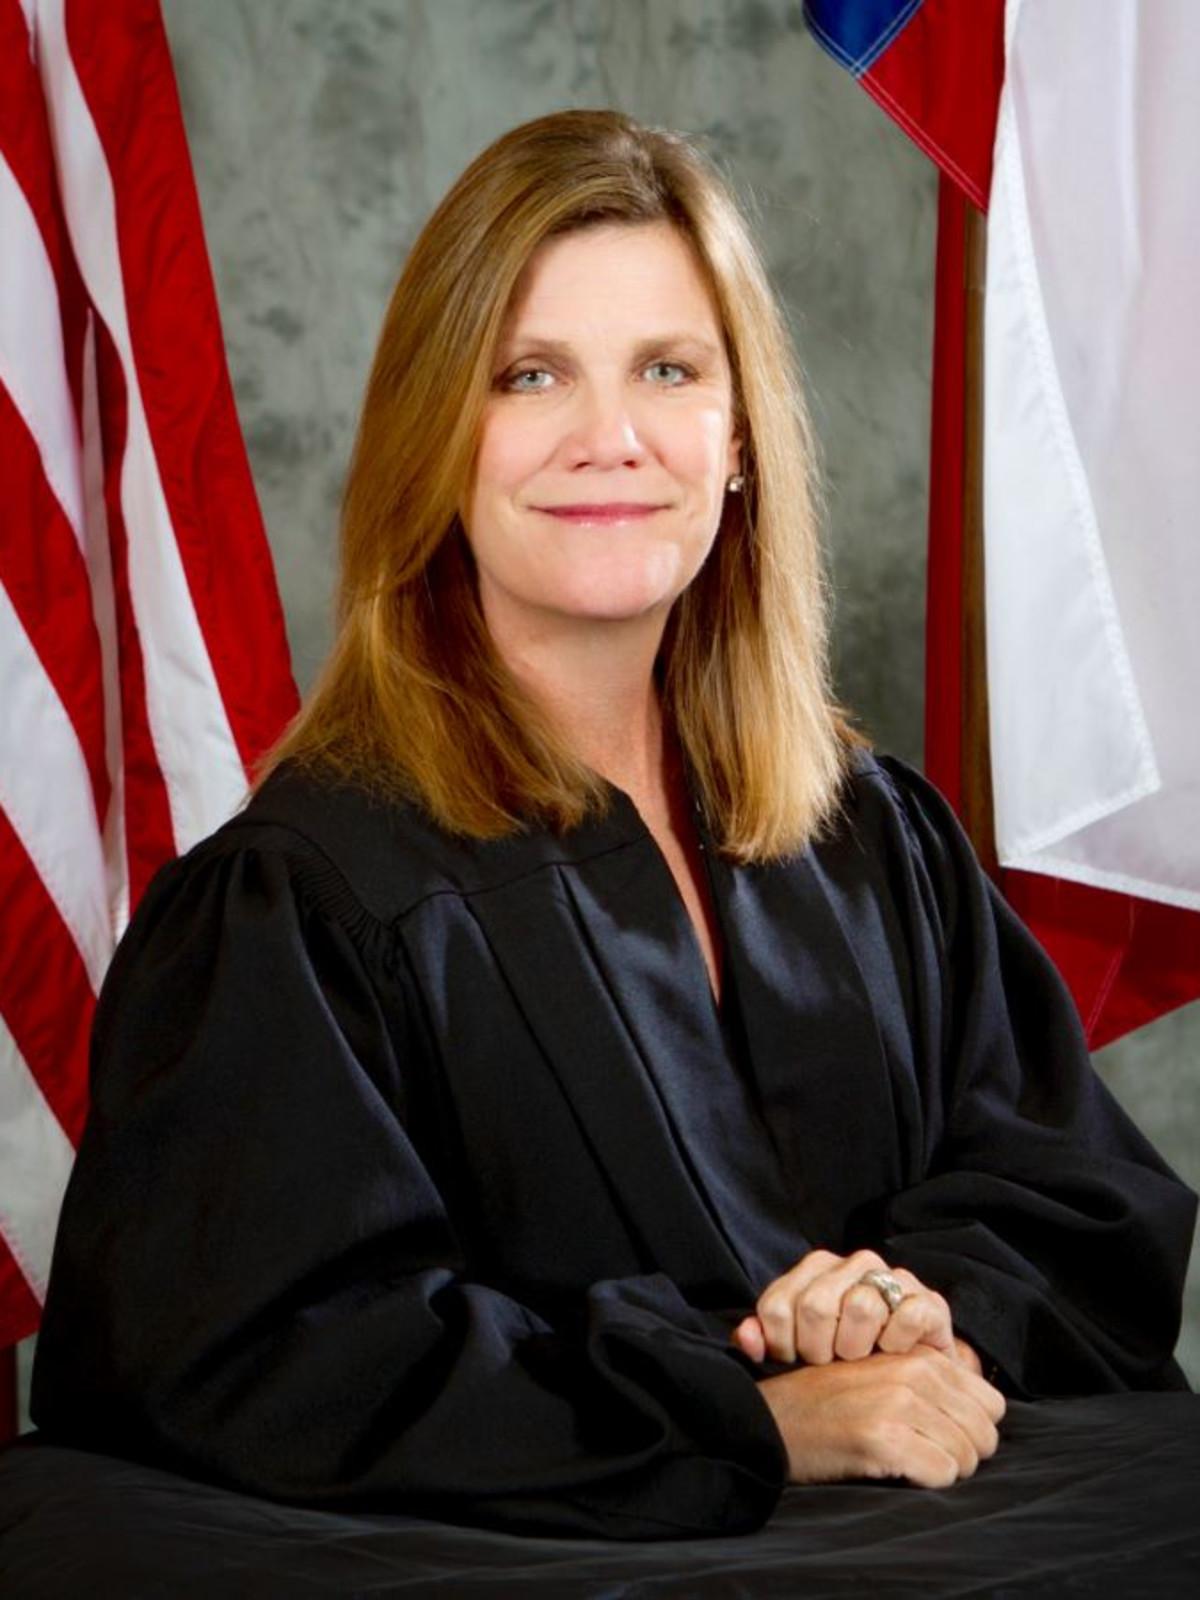 Texas judge tells harrowing tale of attempted murder on 48